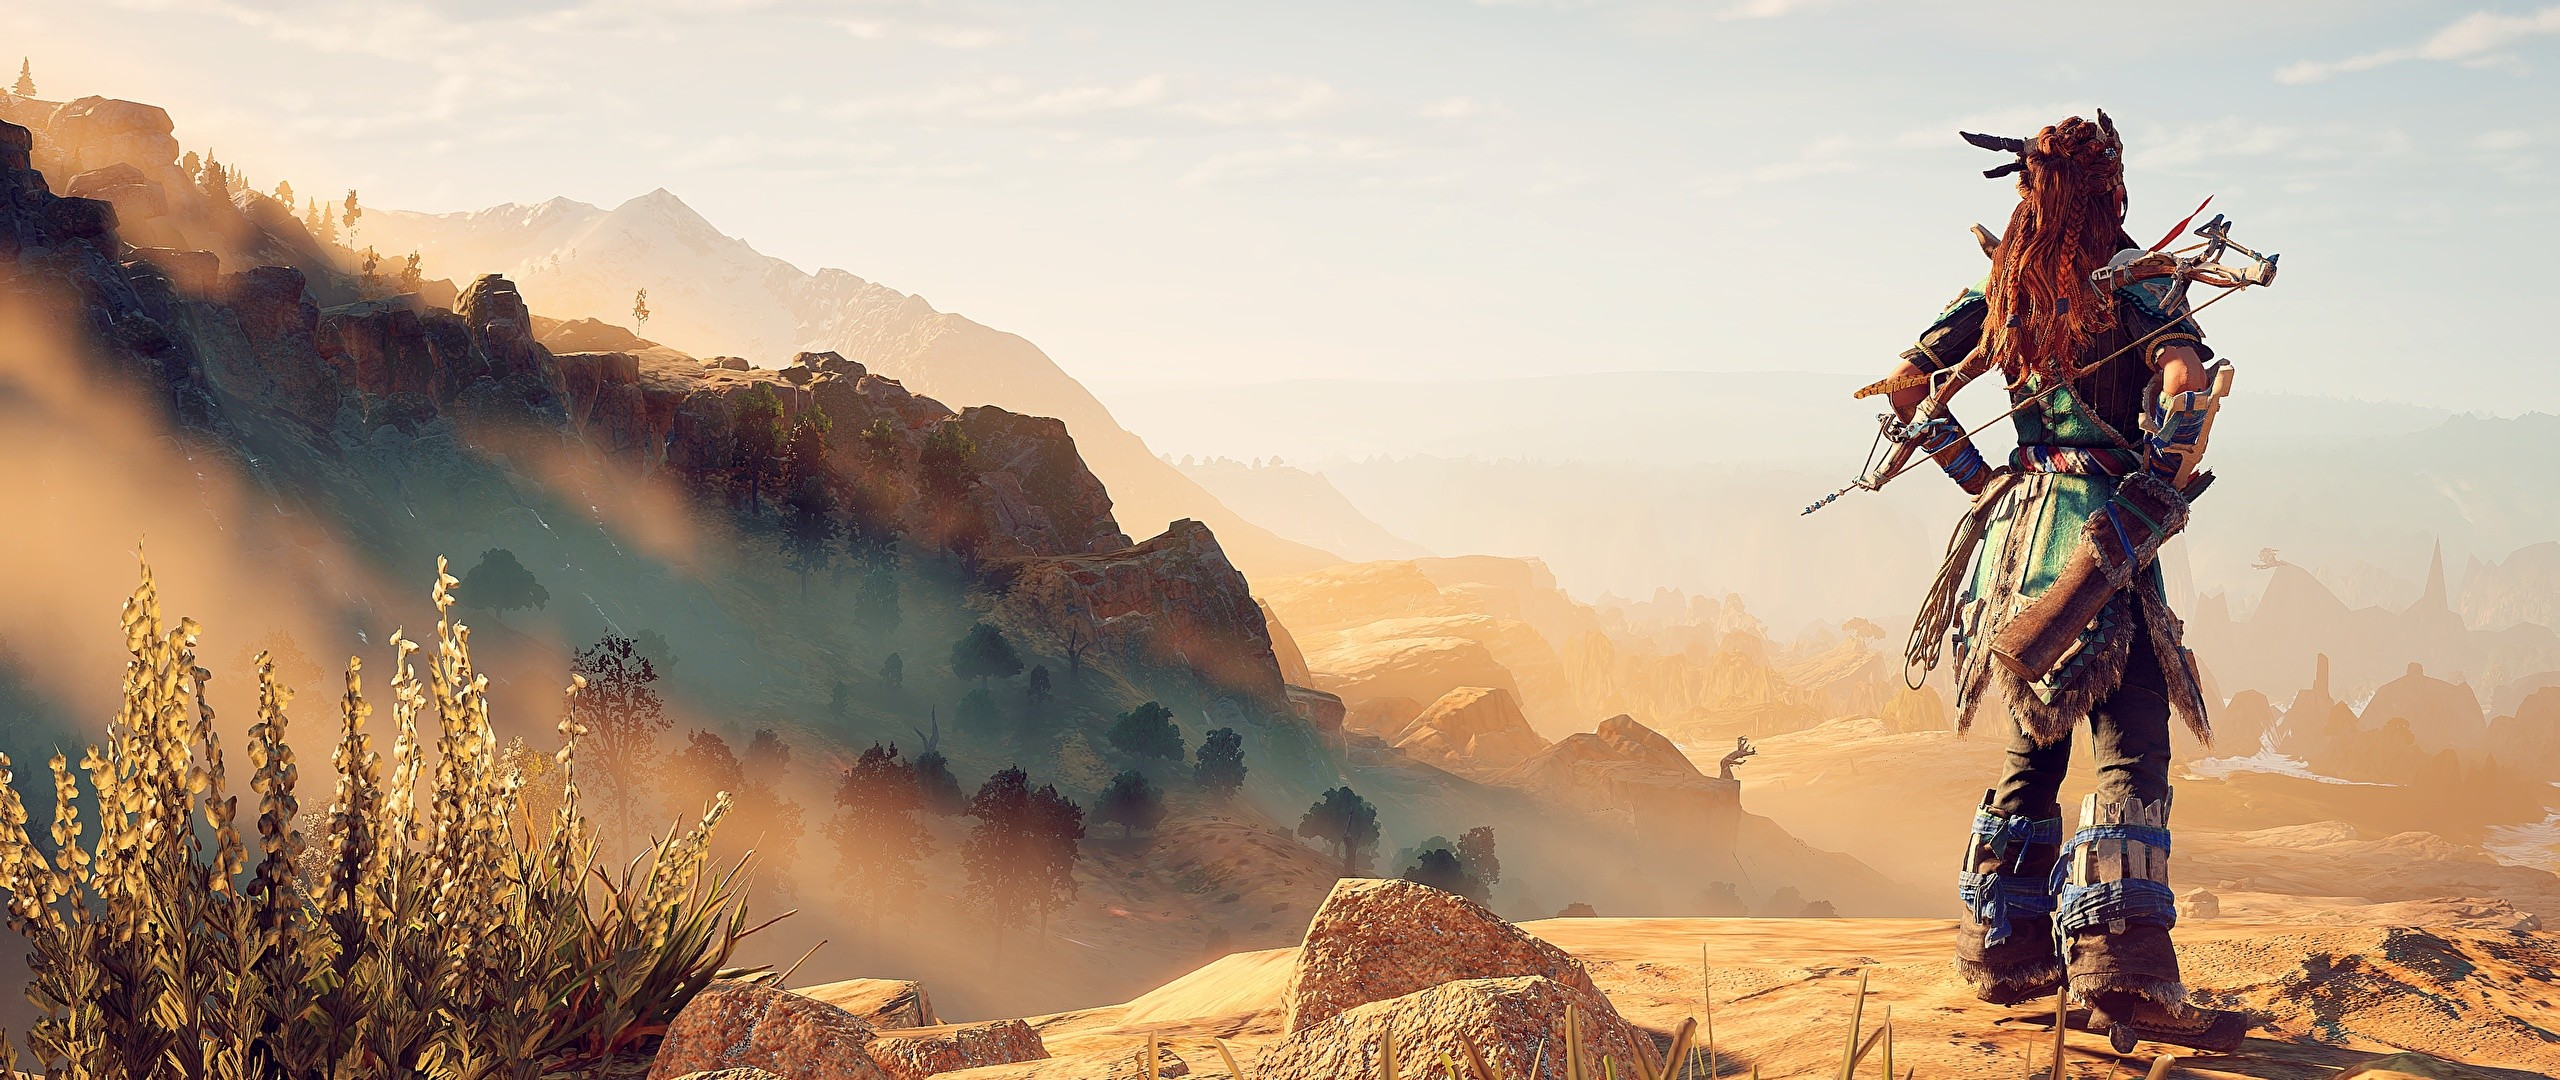 Horizon Zero Dawn Wallpapers (83+ pictures)